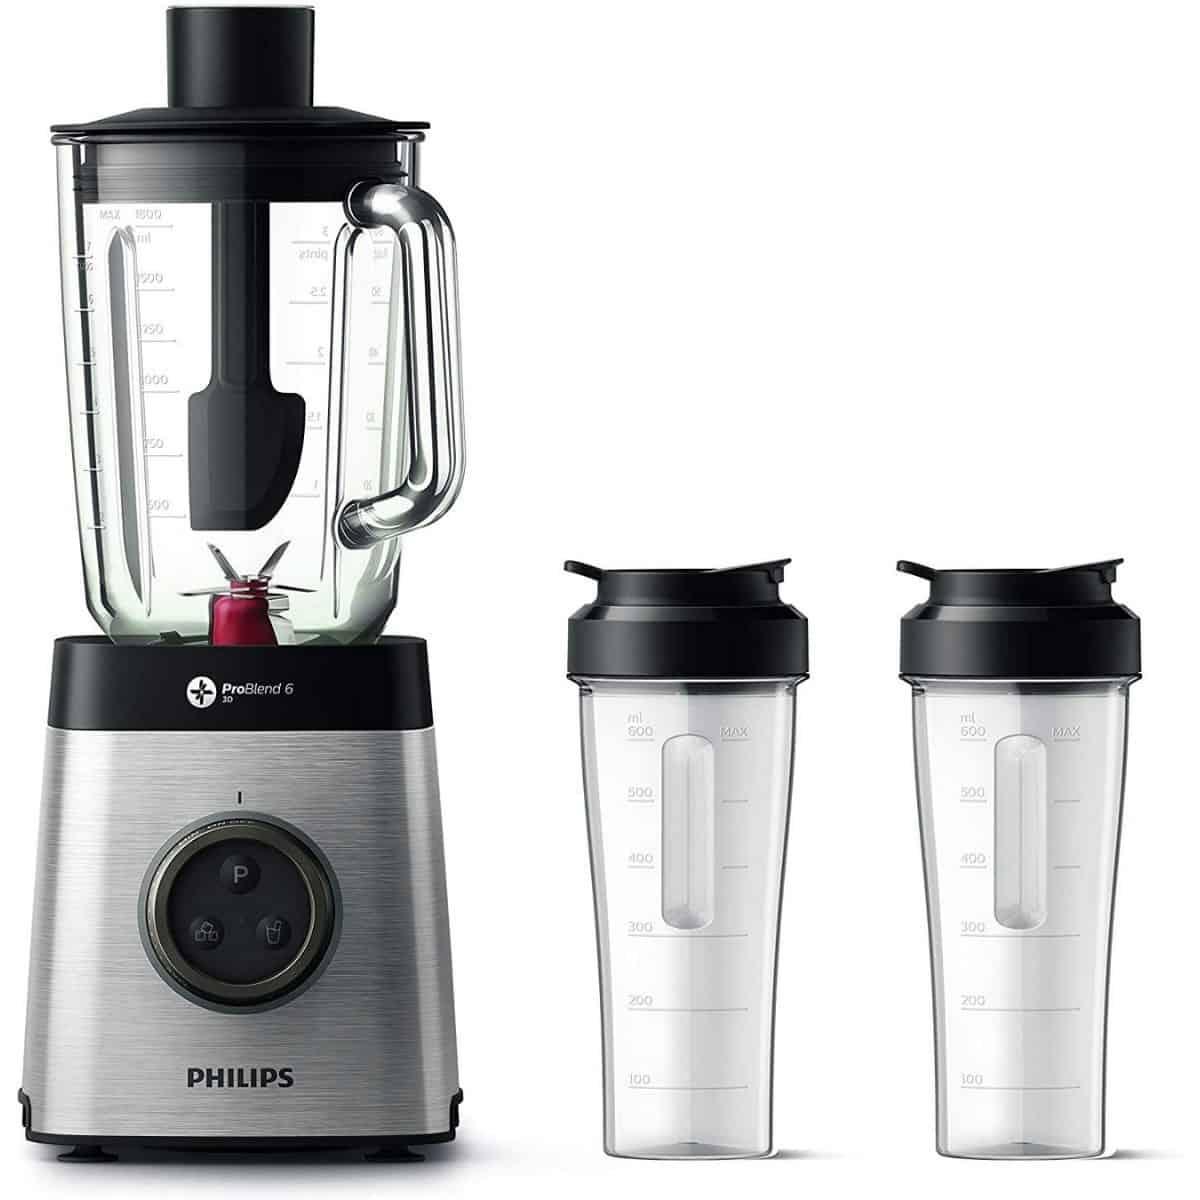 Philips Avance ProBlend 6 3D HR3655/00